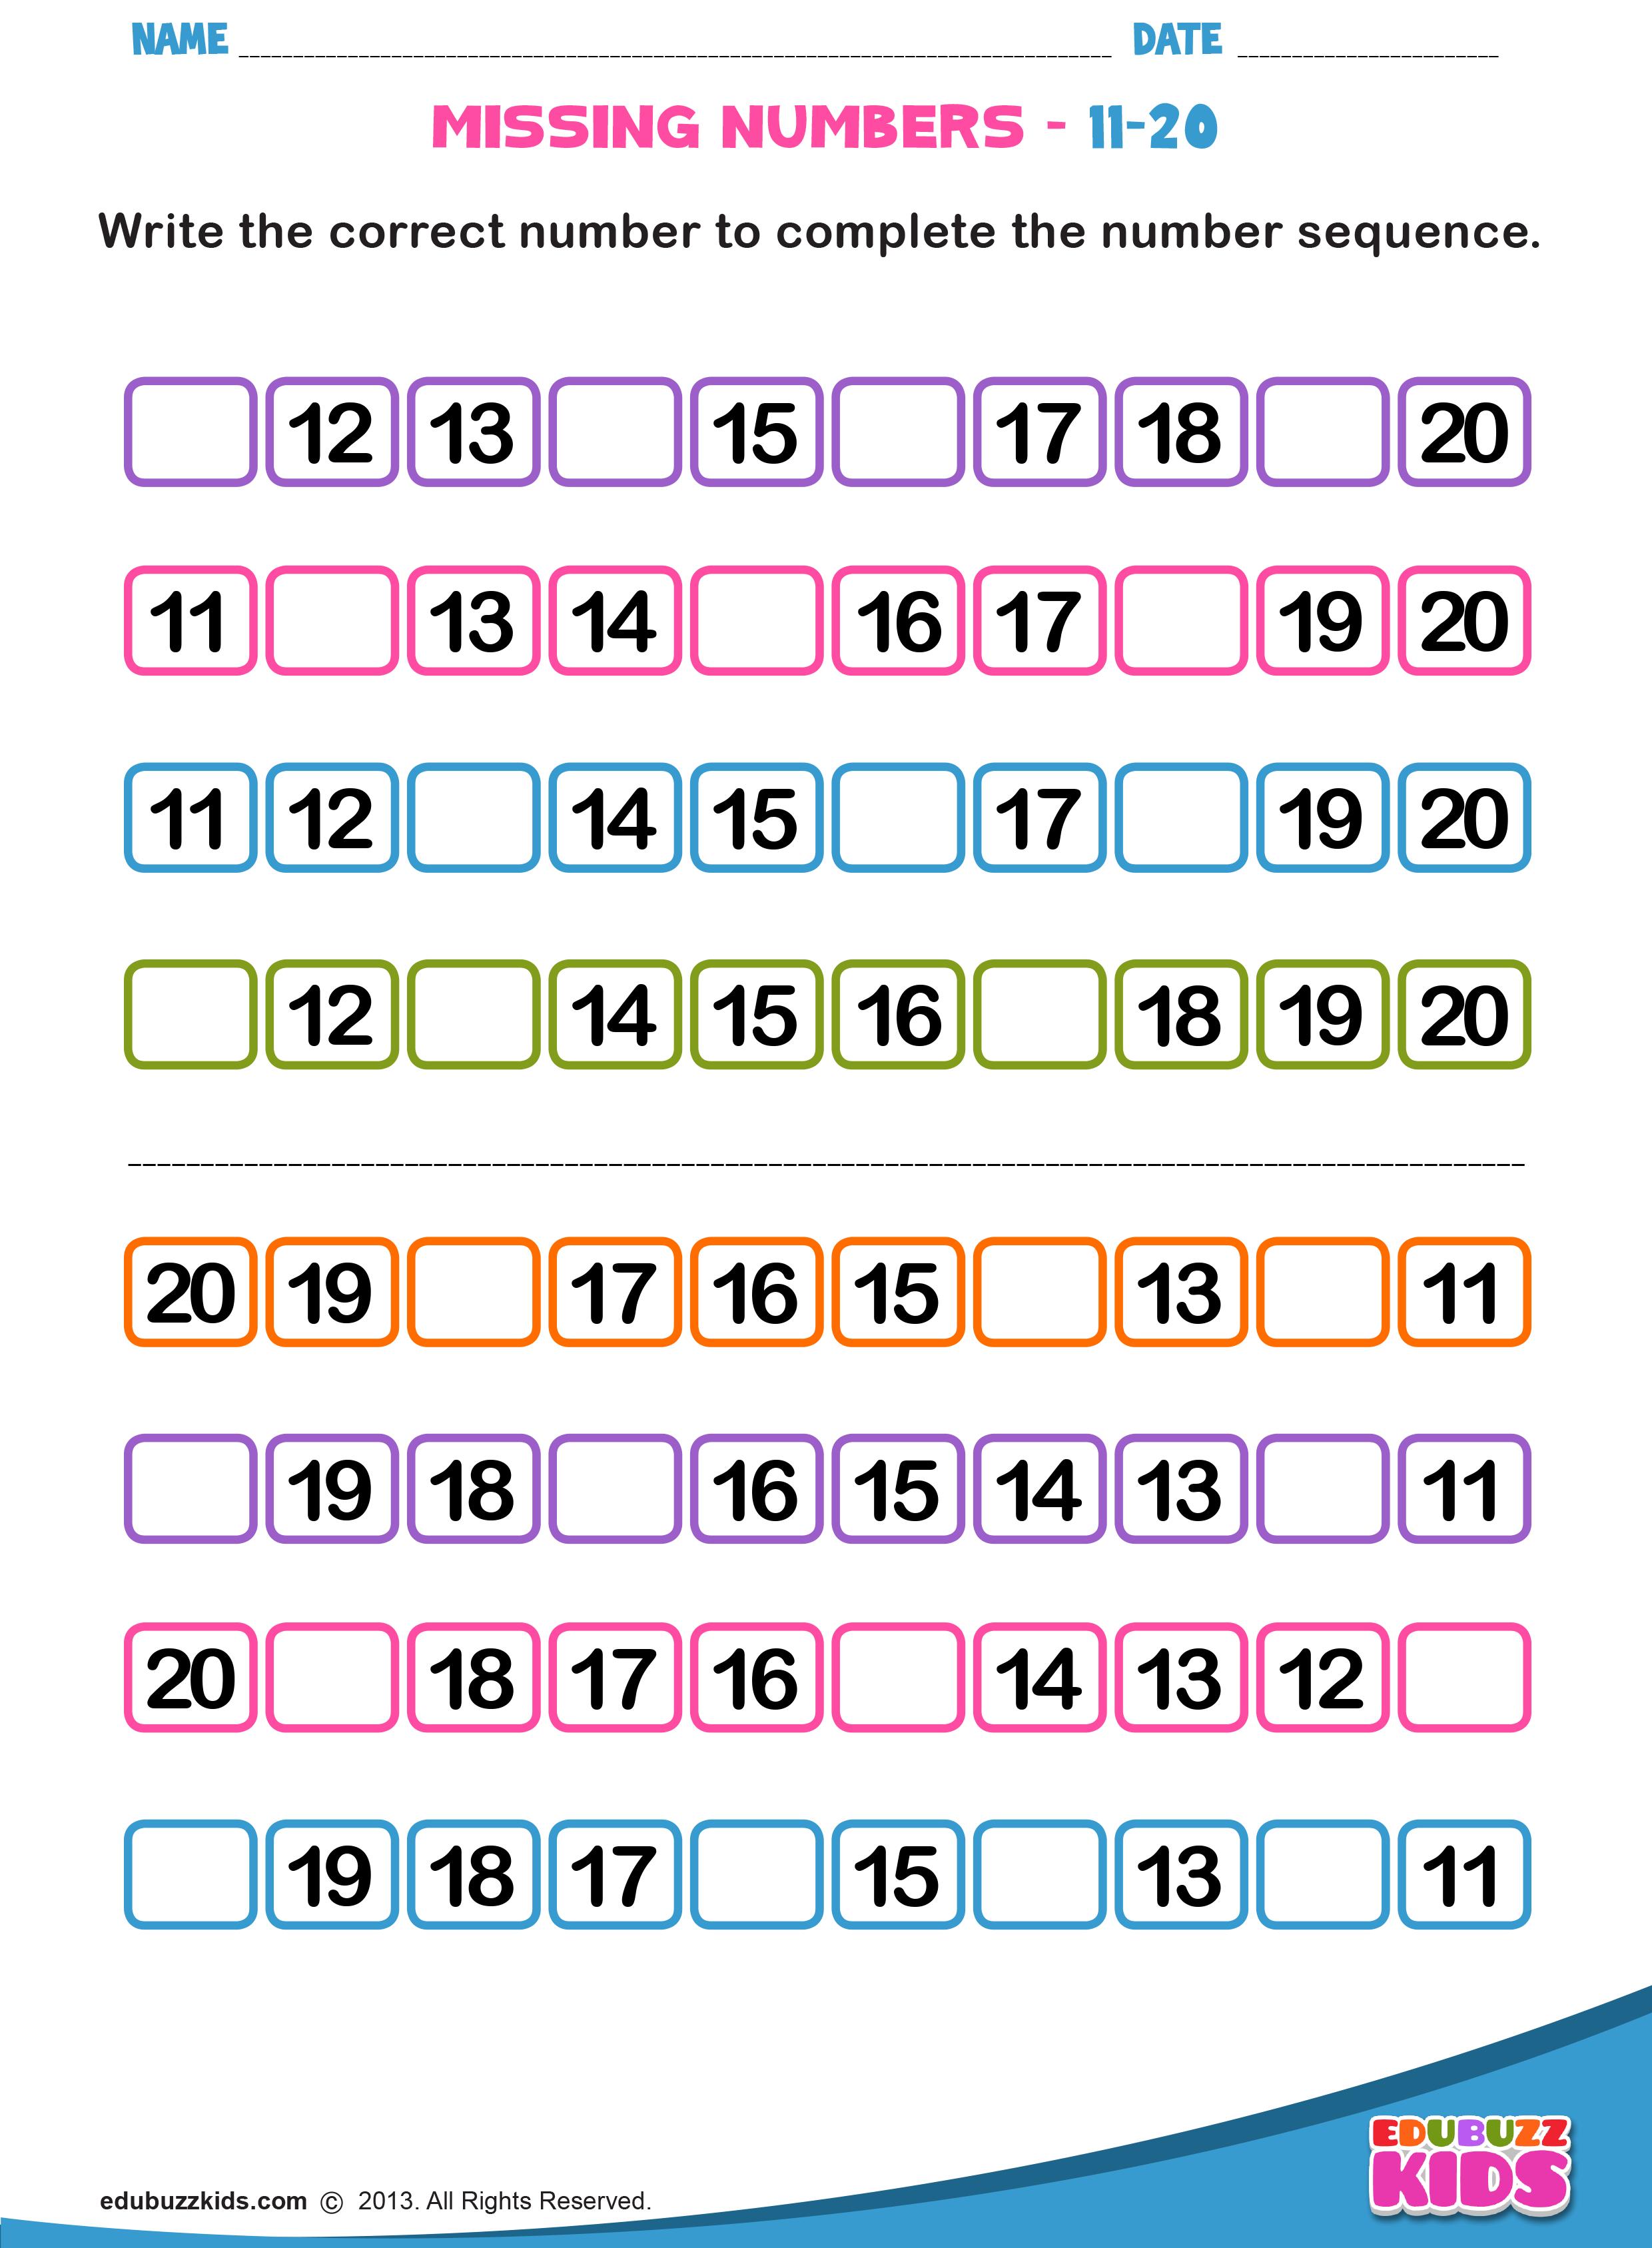 Missing Numbers Atividades De Matematica Pre Escolar Fichas De Exercicios De Matematica Aulas De Matematica [ 3374 x 2480 Pixel ]